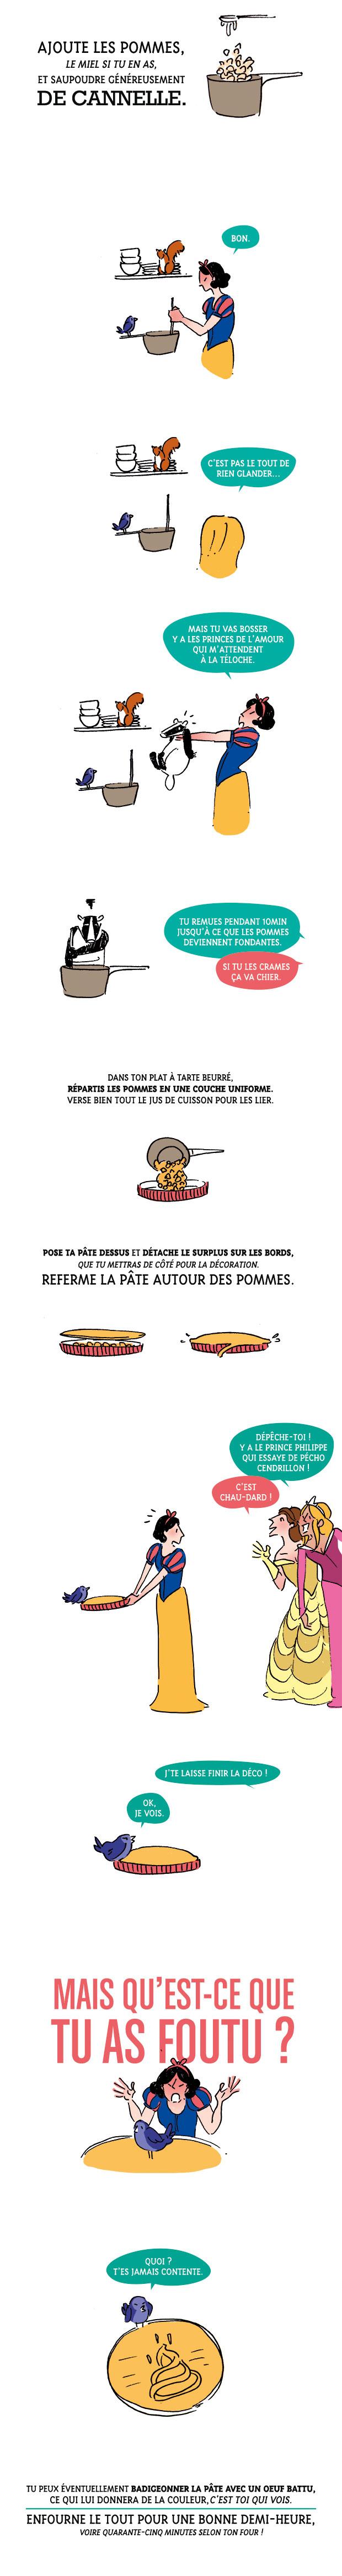 recette-disney-blanche-neige-tarte-aux-pommes-2